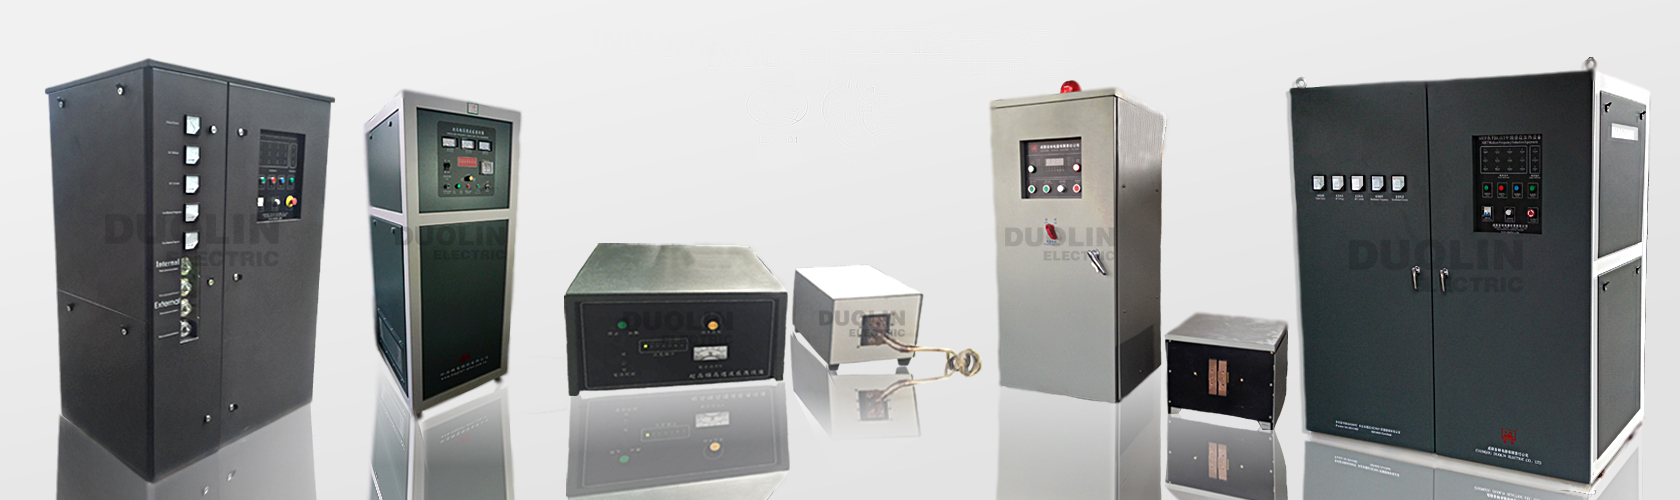 Chengdu Duolin Electric Co., Ltd Main Image